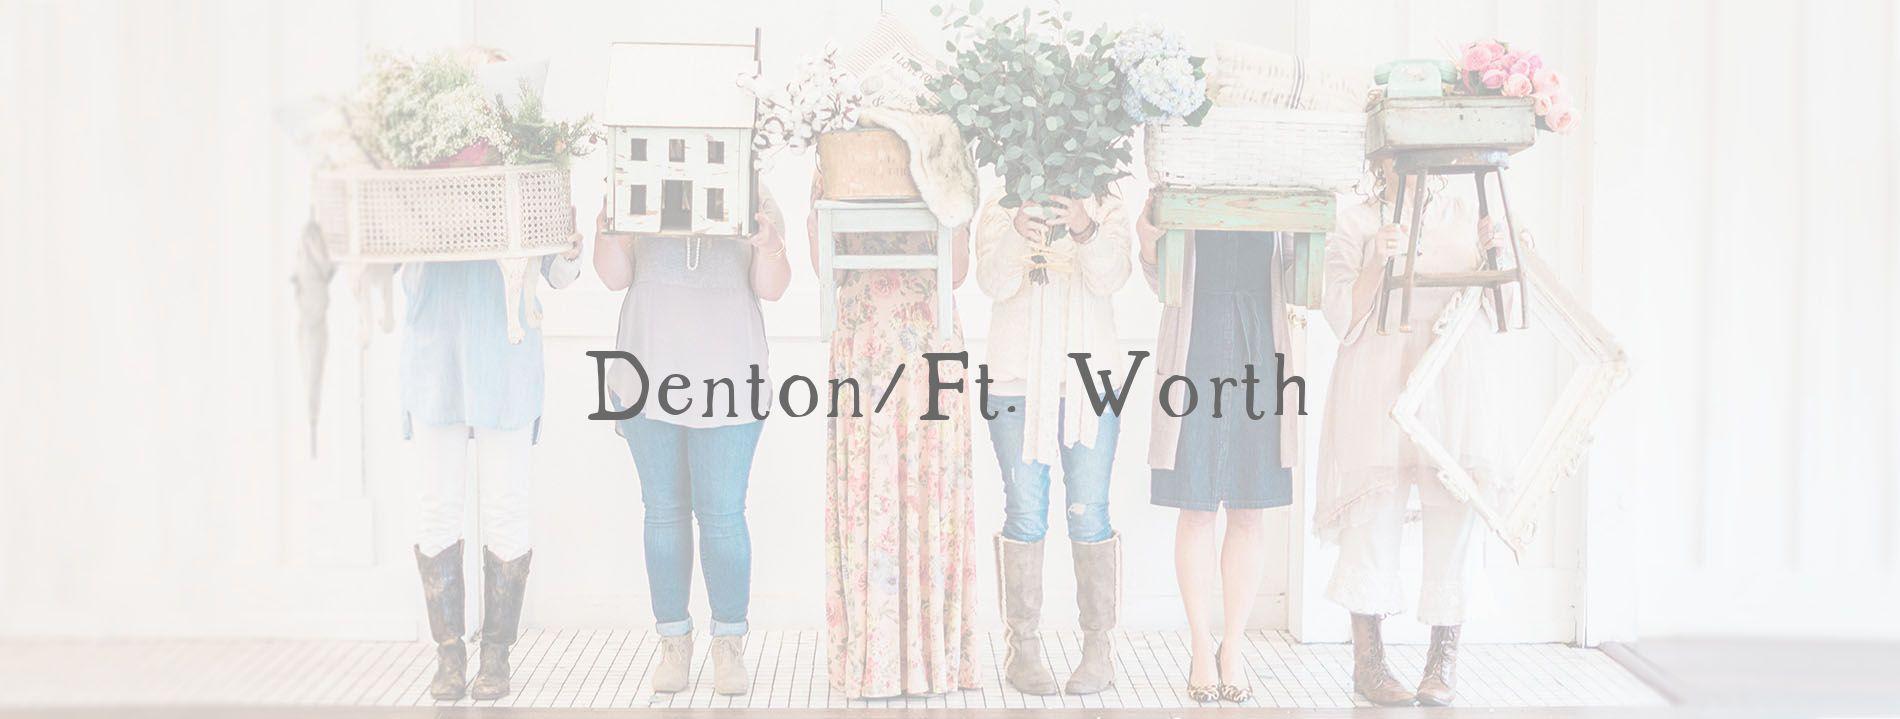 Denton/Ft. Worth